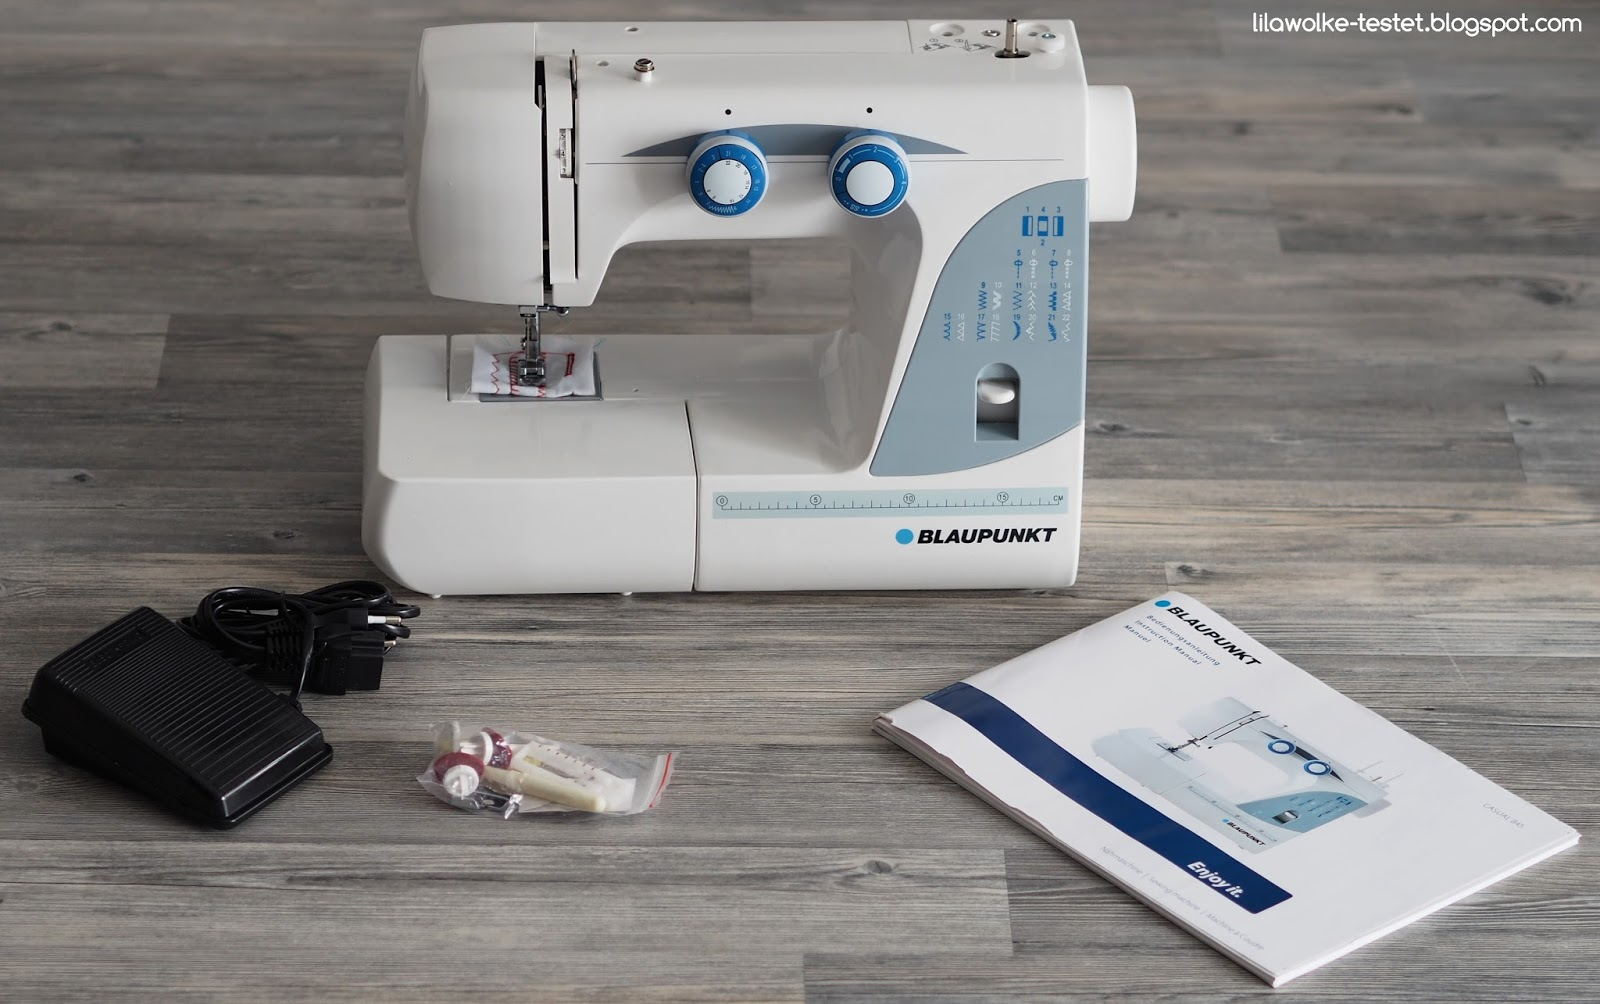 BLAUPUNKT Nähmaschine Casual 845 im Test  Lilawolke  Testet ~ Nähmaschine Unterfaden Aufspulen